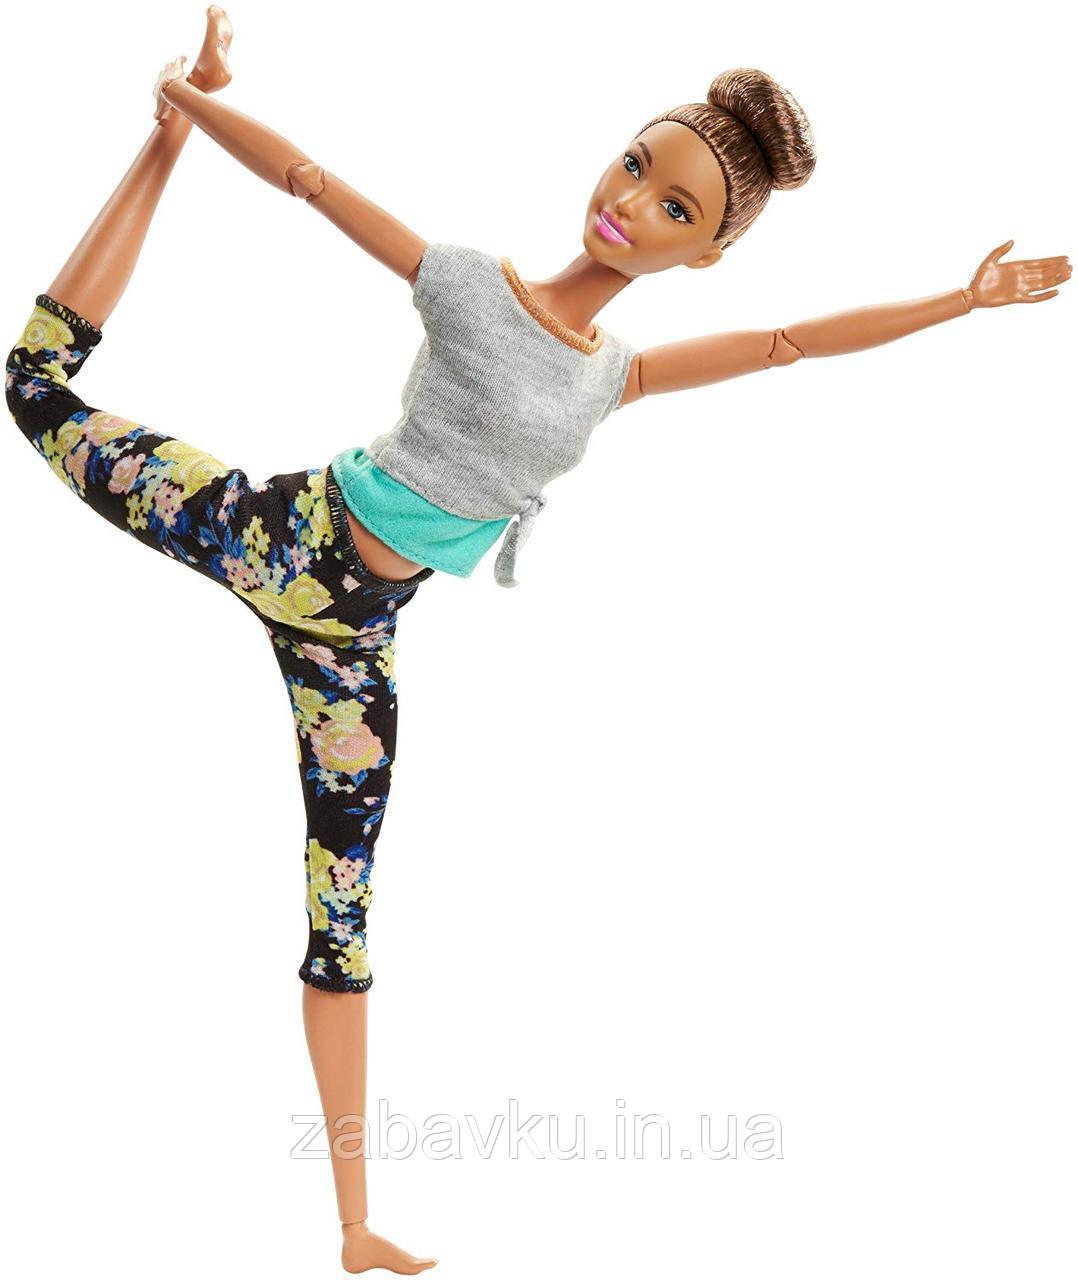 Барби йога безграничные движения шарнирная кукла Barbie Made To Move Doll Бабрі йога брюнетка